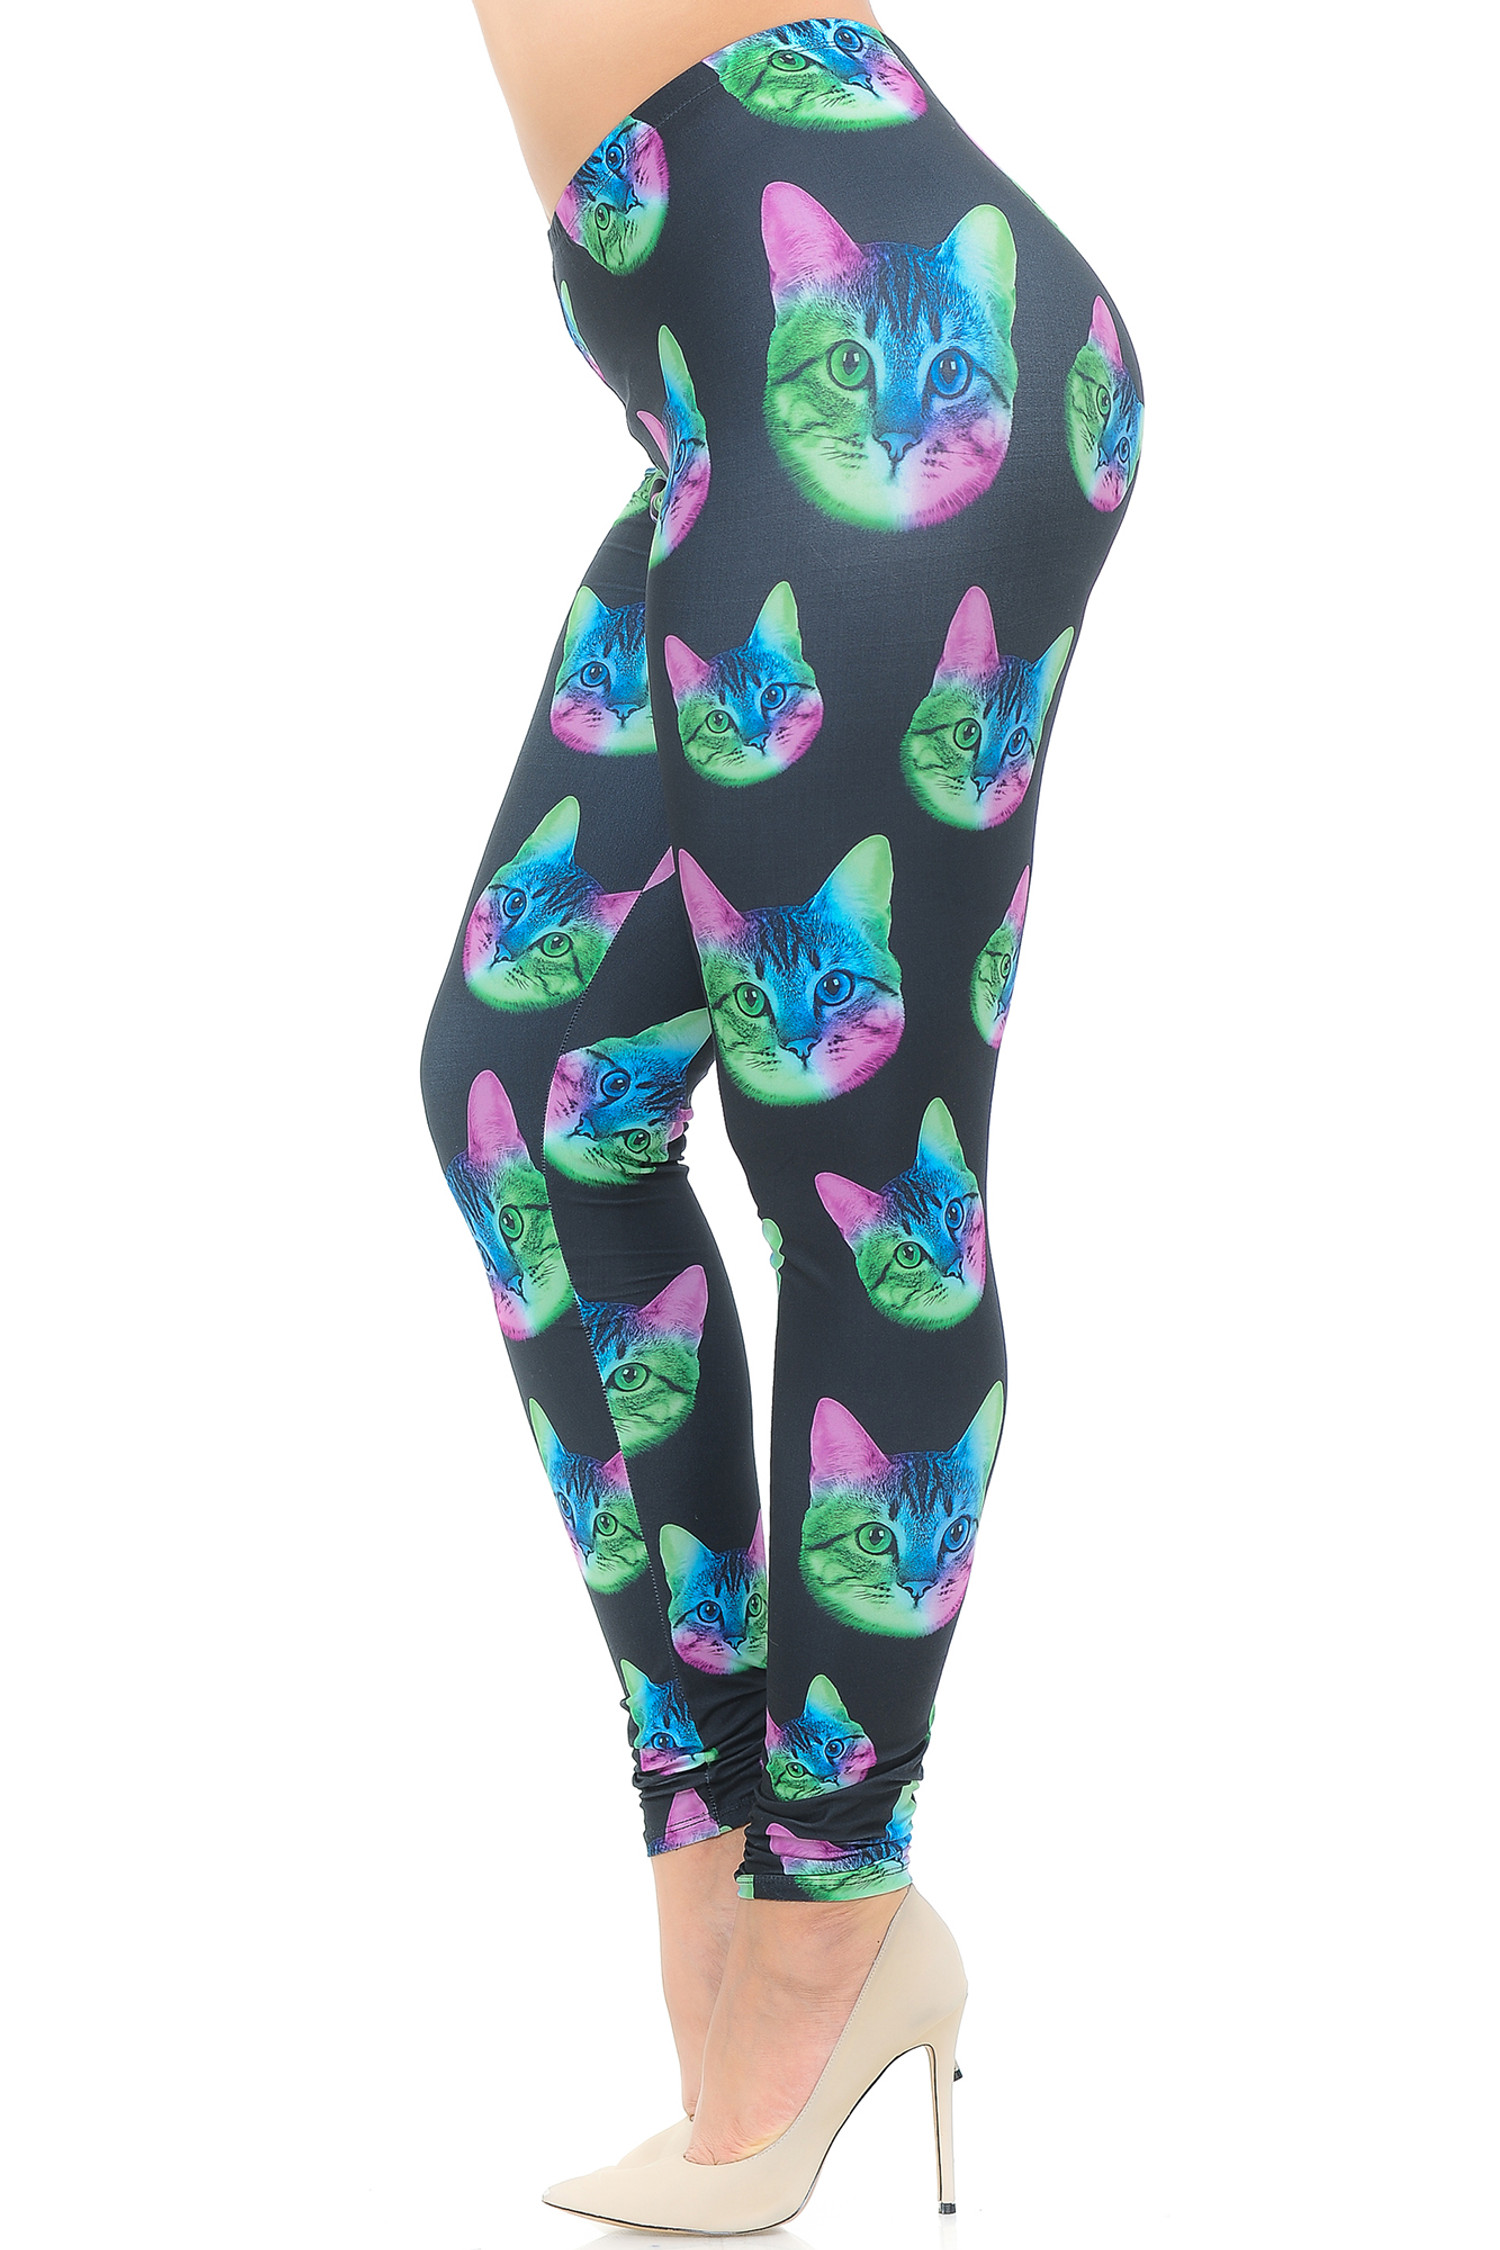 Creamy Soft Neon Cats Extra Plus Size Leggings - 3X-5X - USA Fashion™